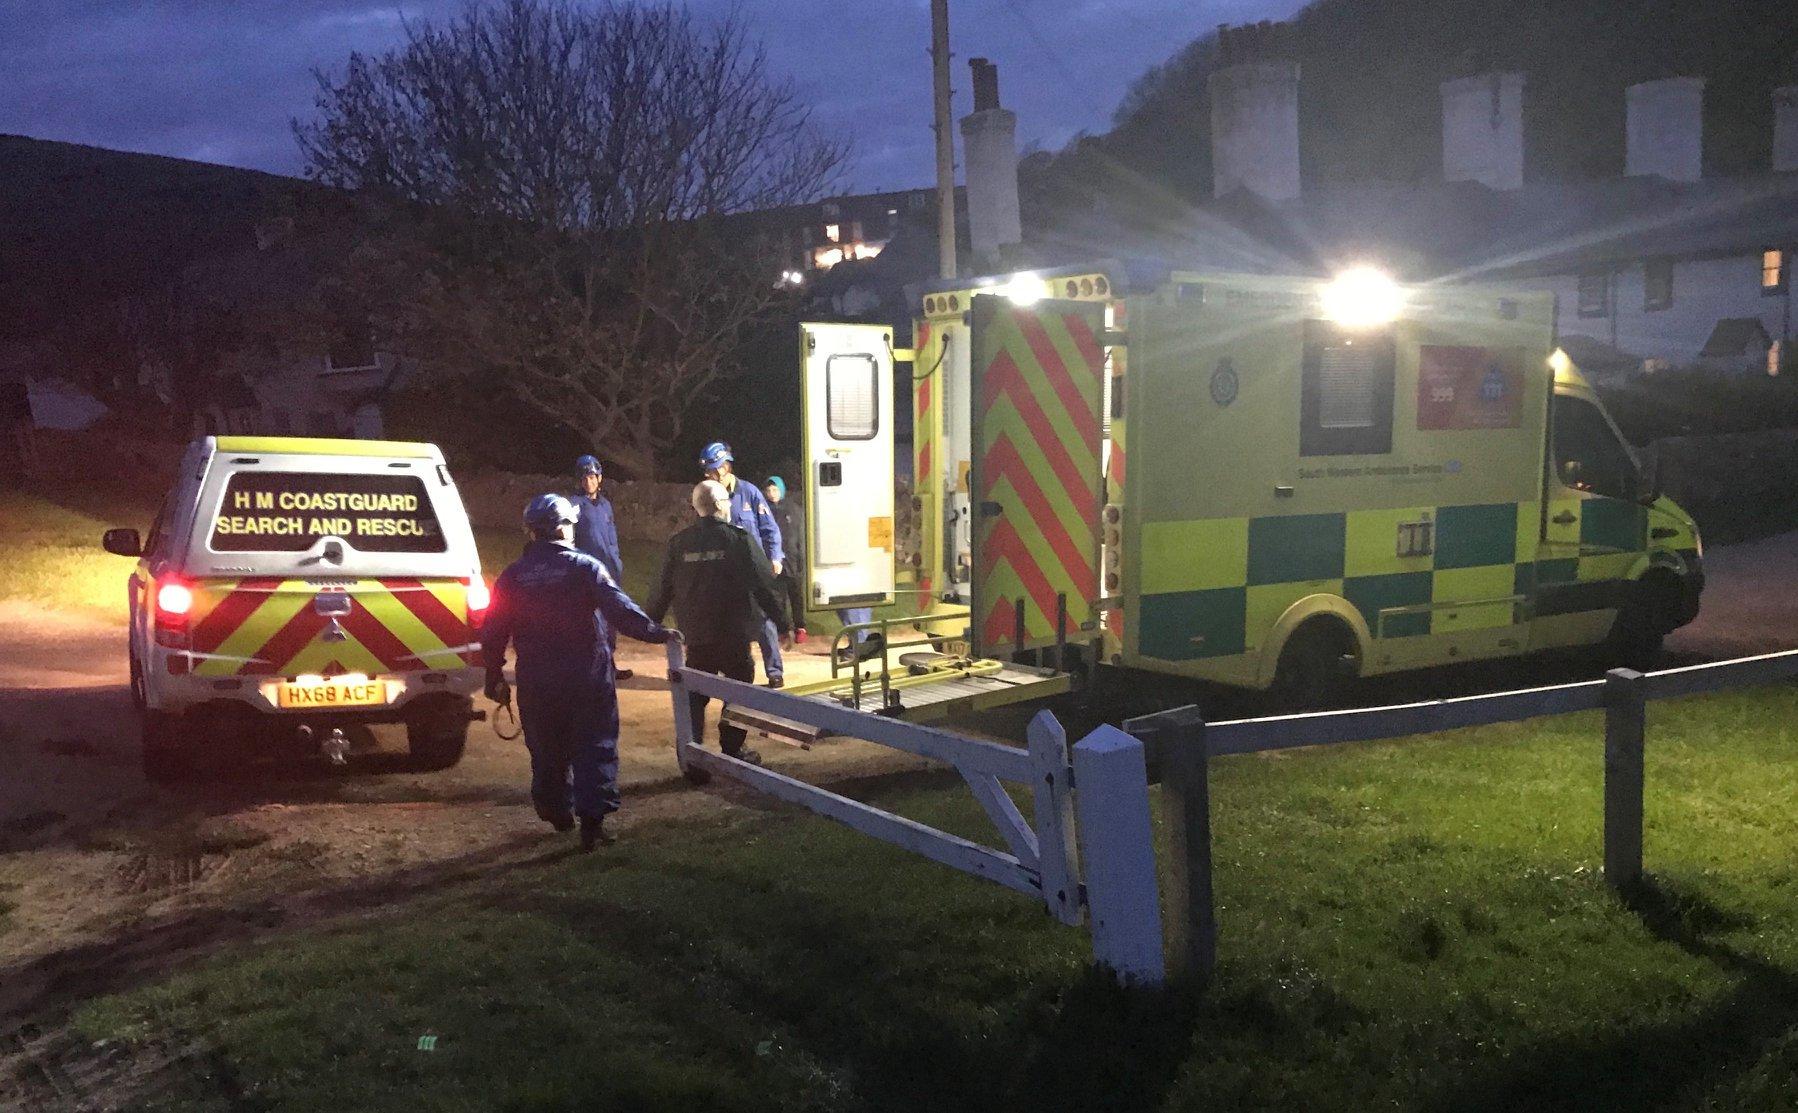 Lulworth and Kimmeridge coastguard teams help rescue woman